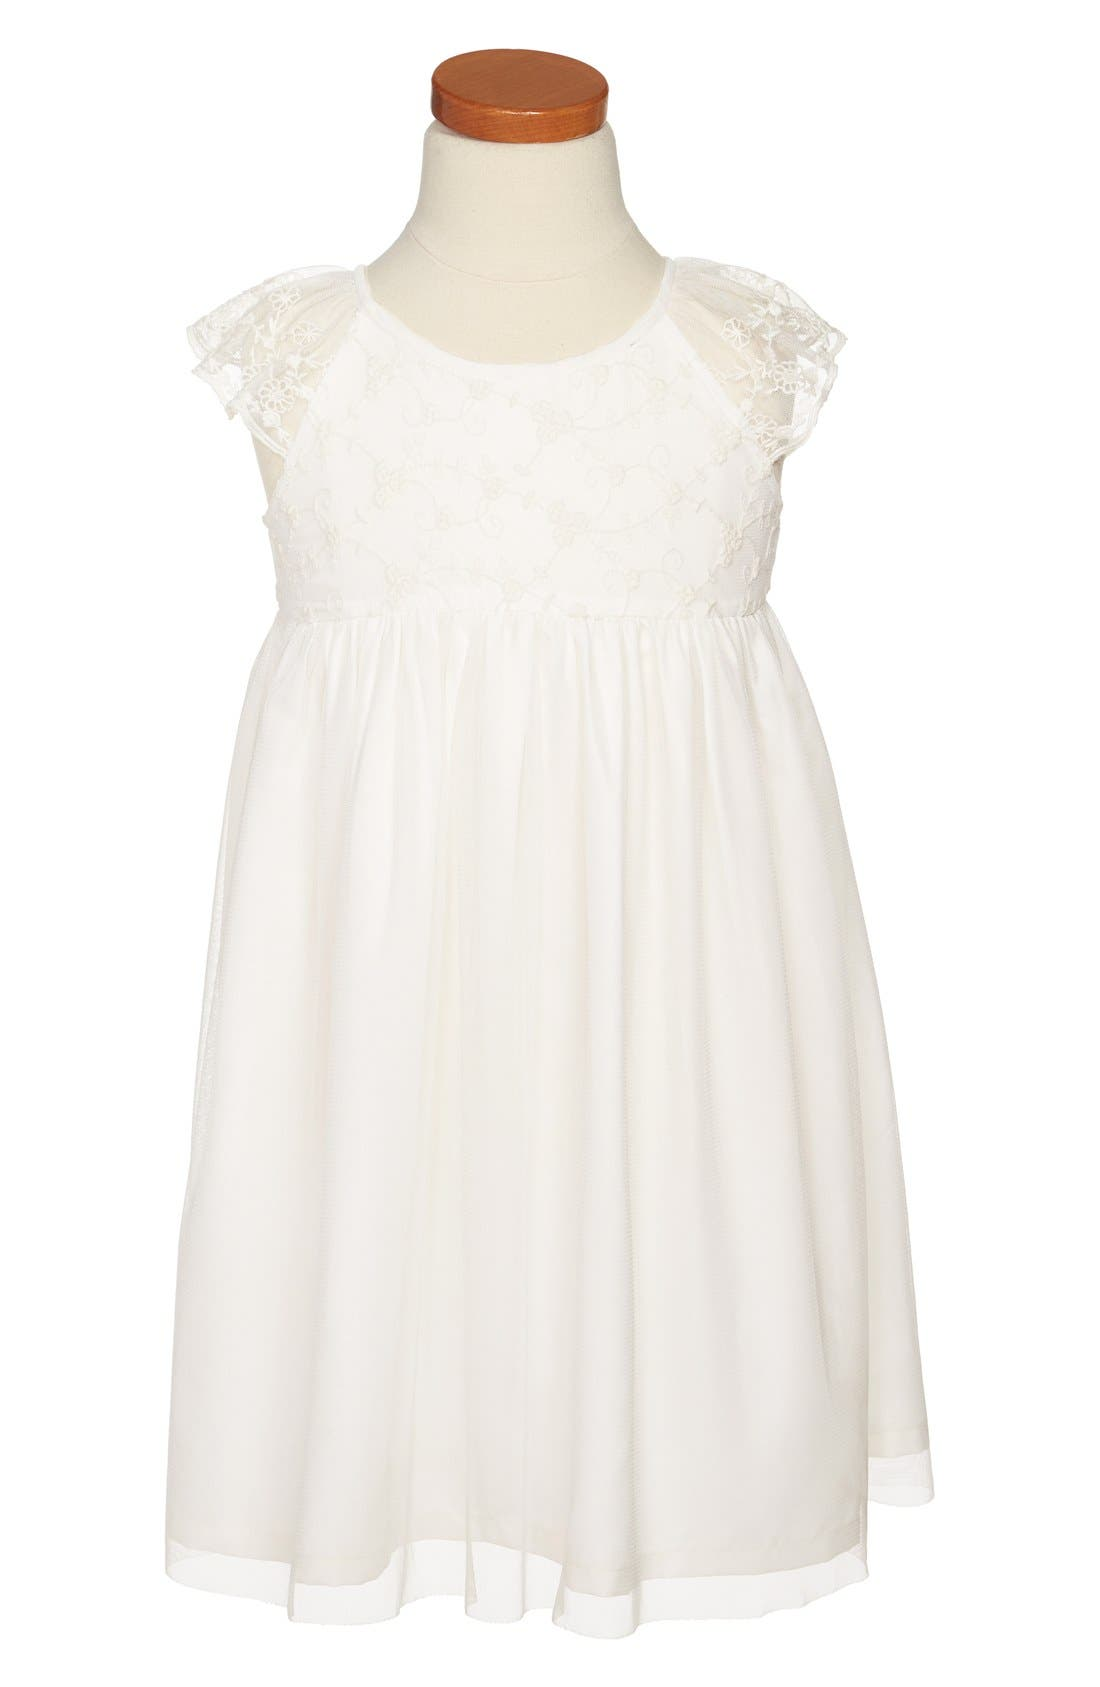 Main Image - Ruby & Bloom 'Joie' Dress (Toddler Girls, Little Girls & Big Girls)